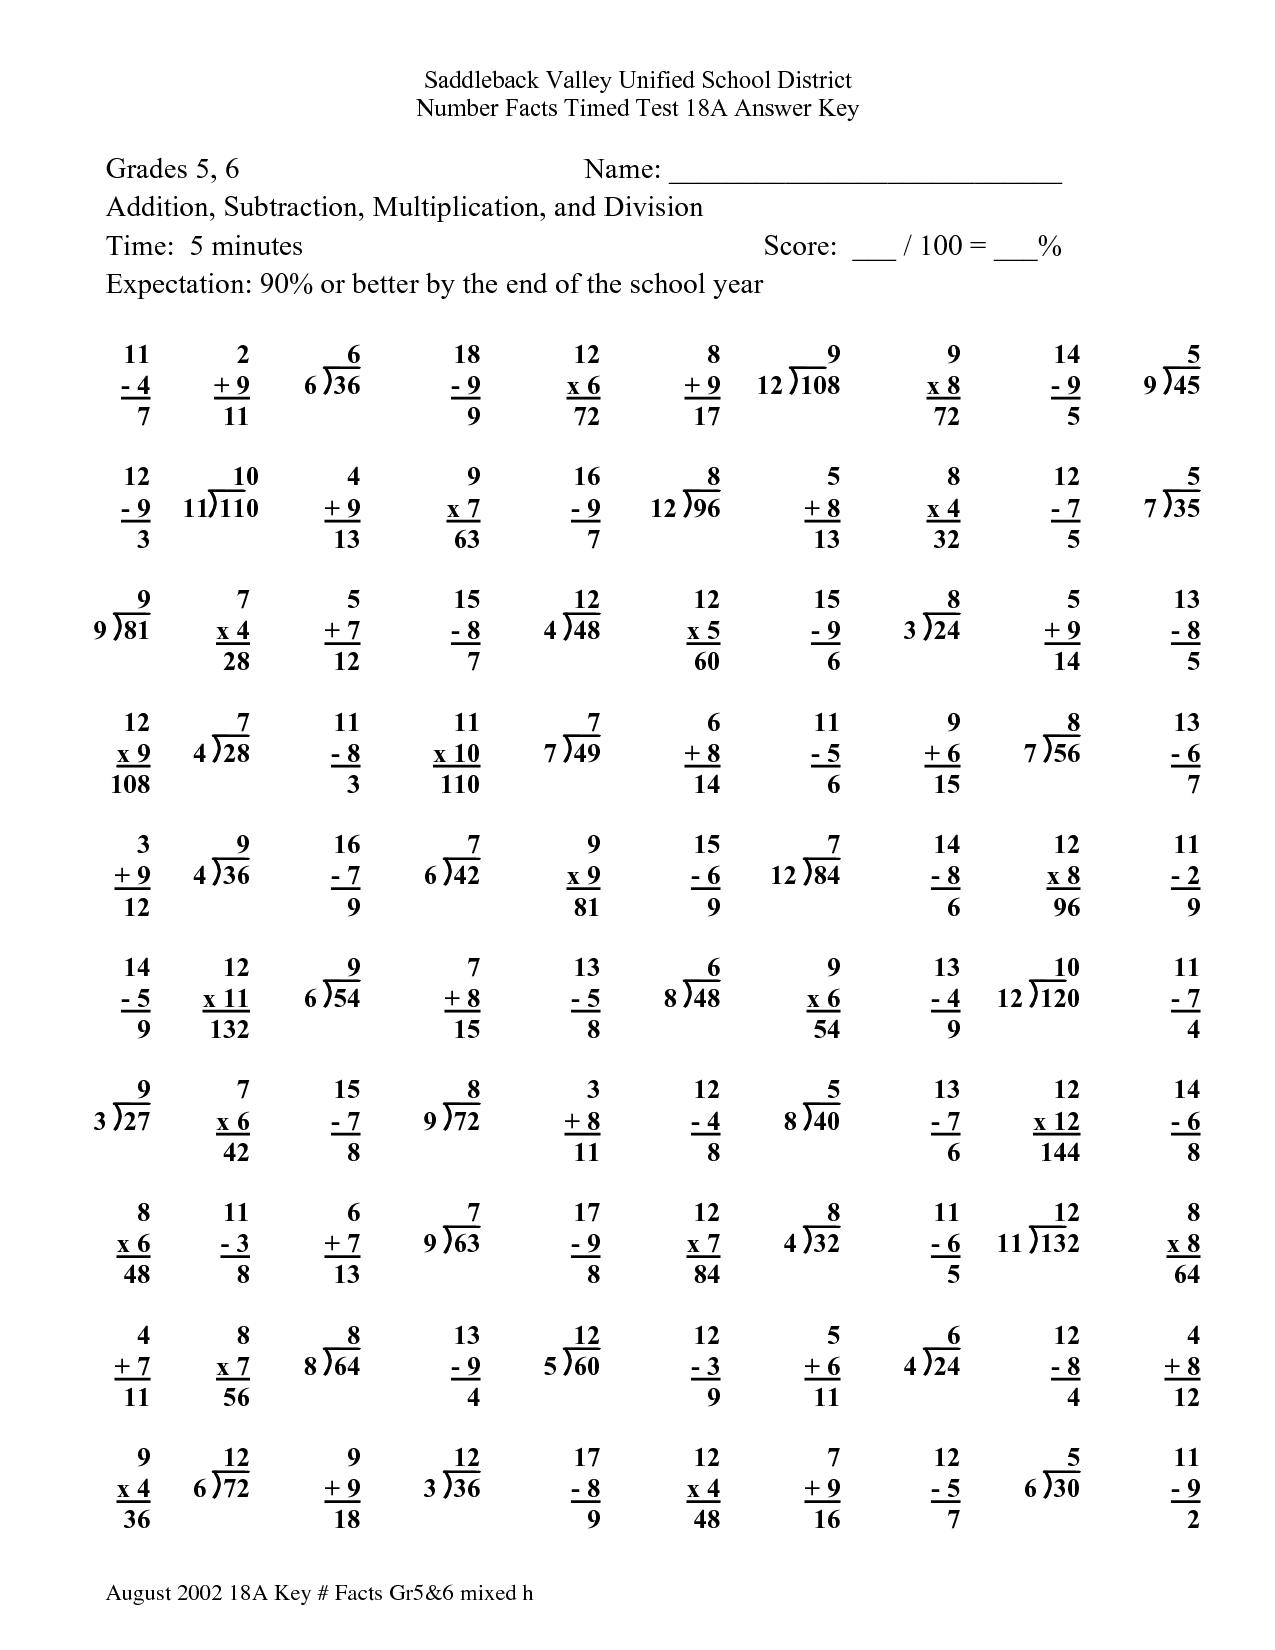 Dditi Subtr Cti Multiplic Ti Nd Divisi W Ksheets